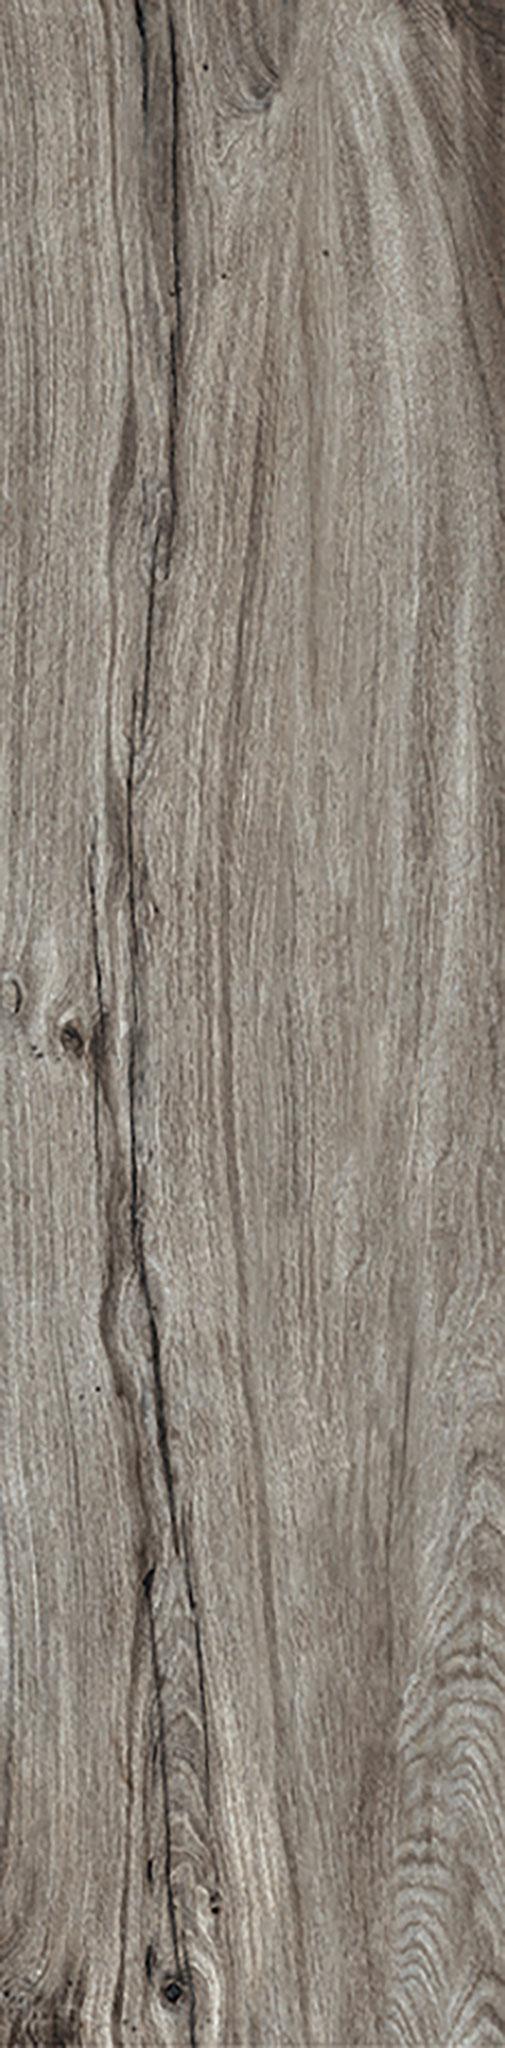 Dalle St Malo Grey 30x120cm